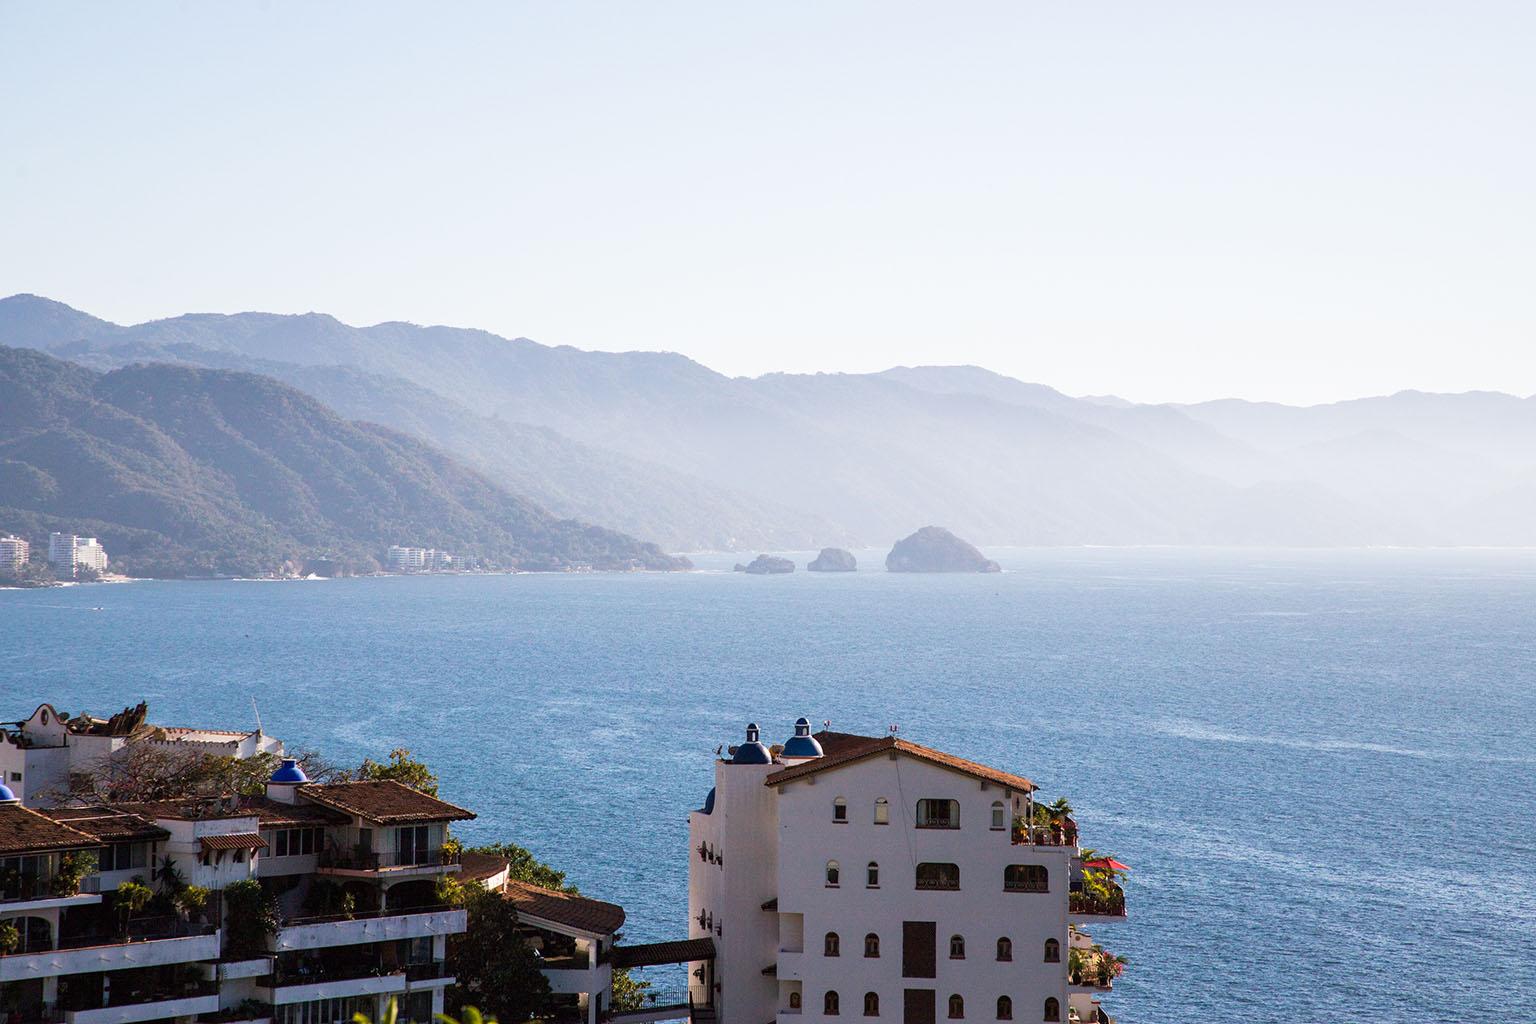 Views from VIlla Azul, in Conchas Chinas